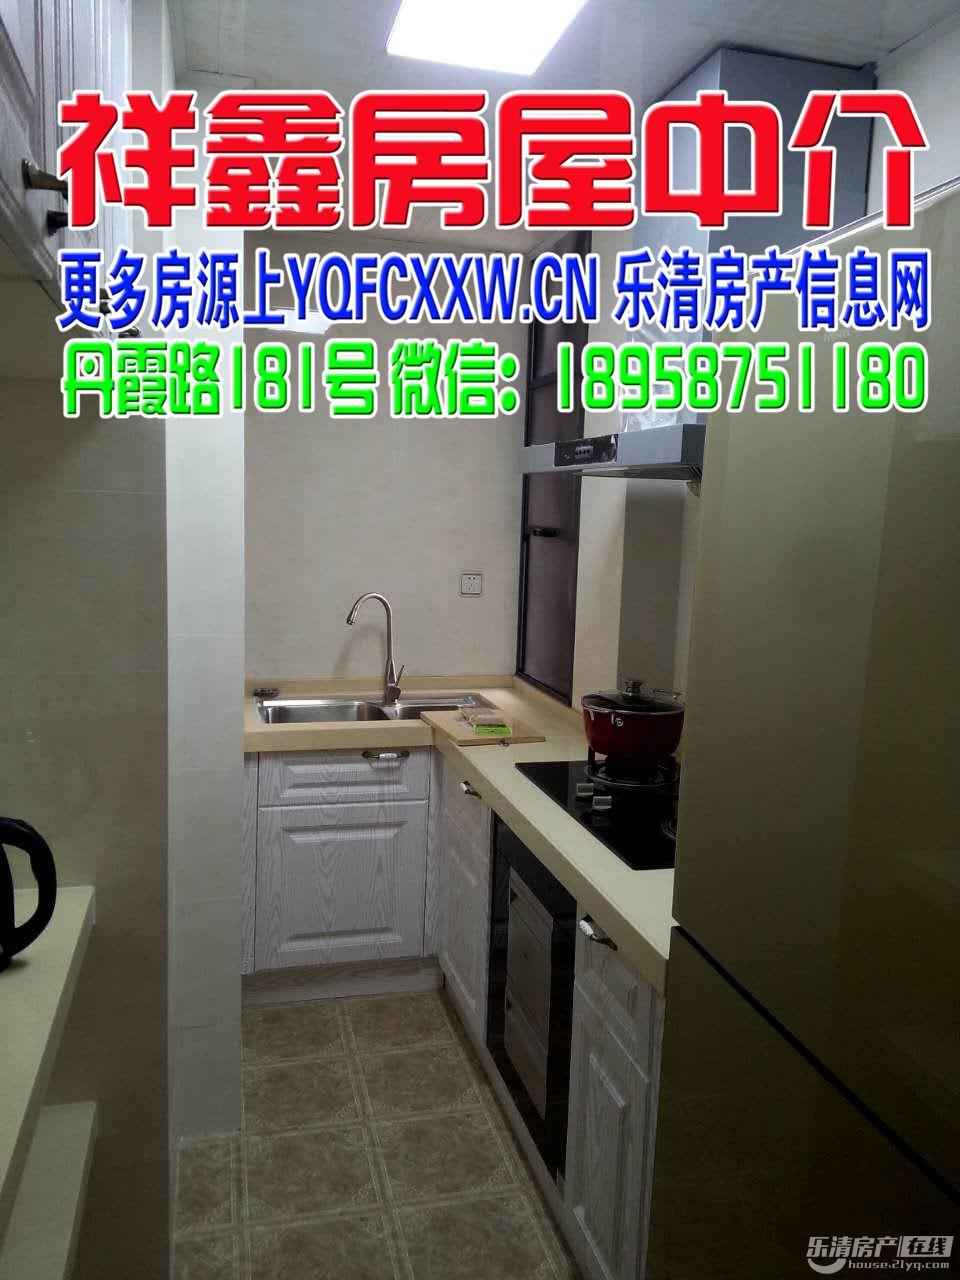 http://house.21yq.com/userfiles/image/20160630/30141151bd4b9eecd24418.jpg